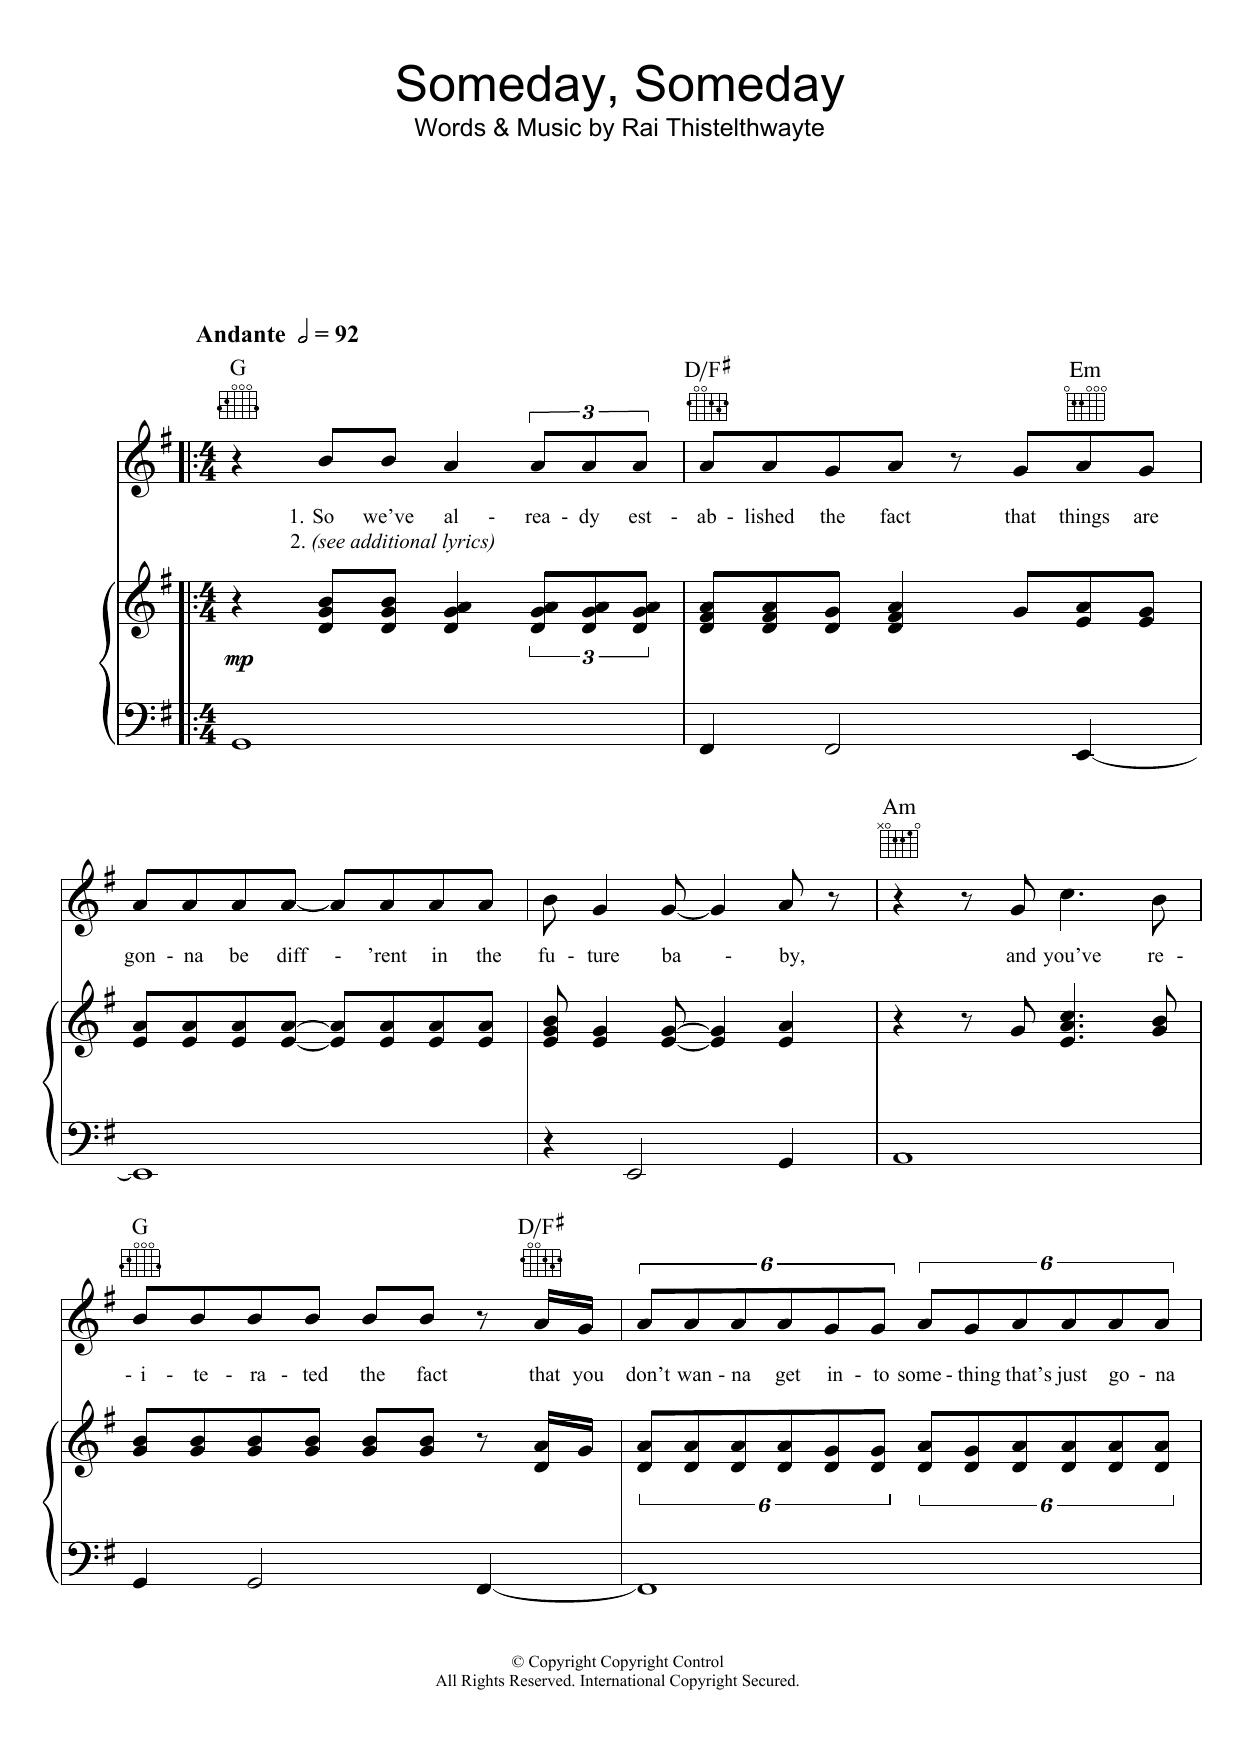 Someday, Someday (Piano, Vocal & Guitar)